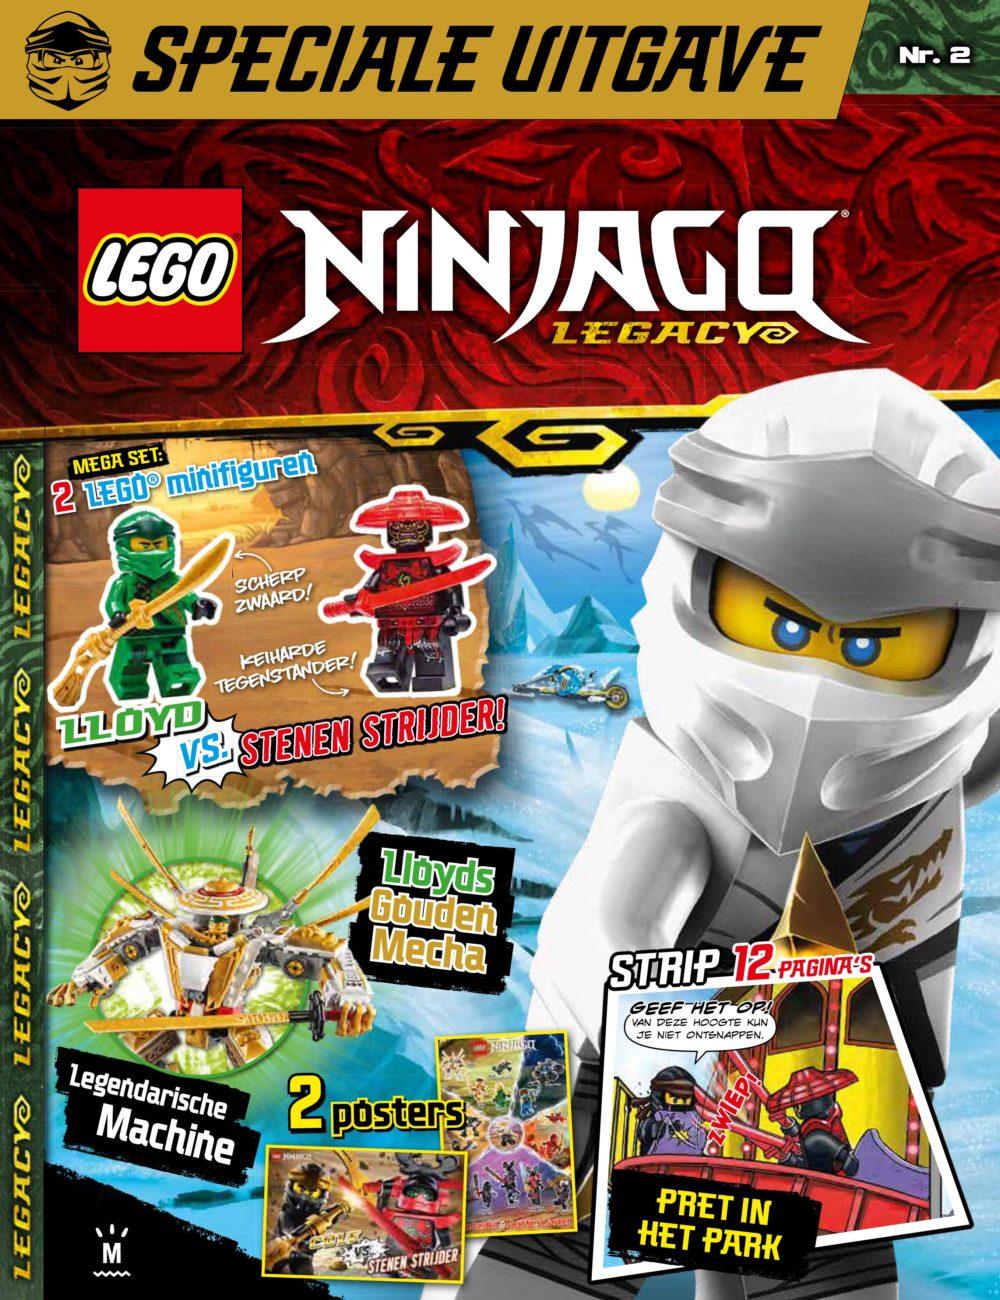 LEGO Ninjago Legacy nr. 2